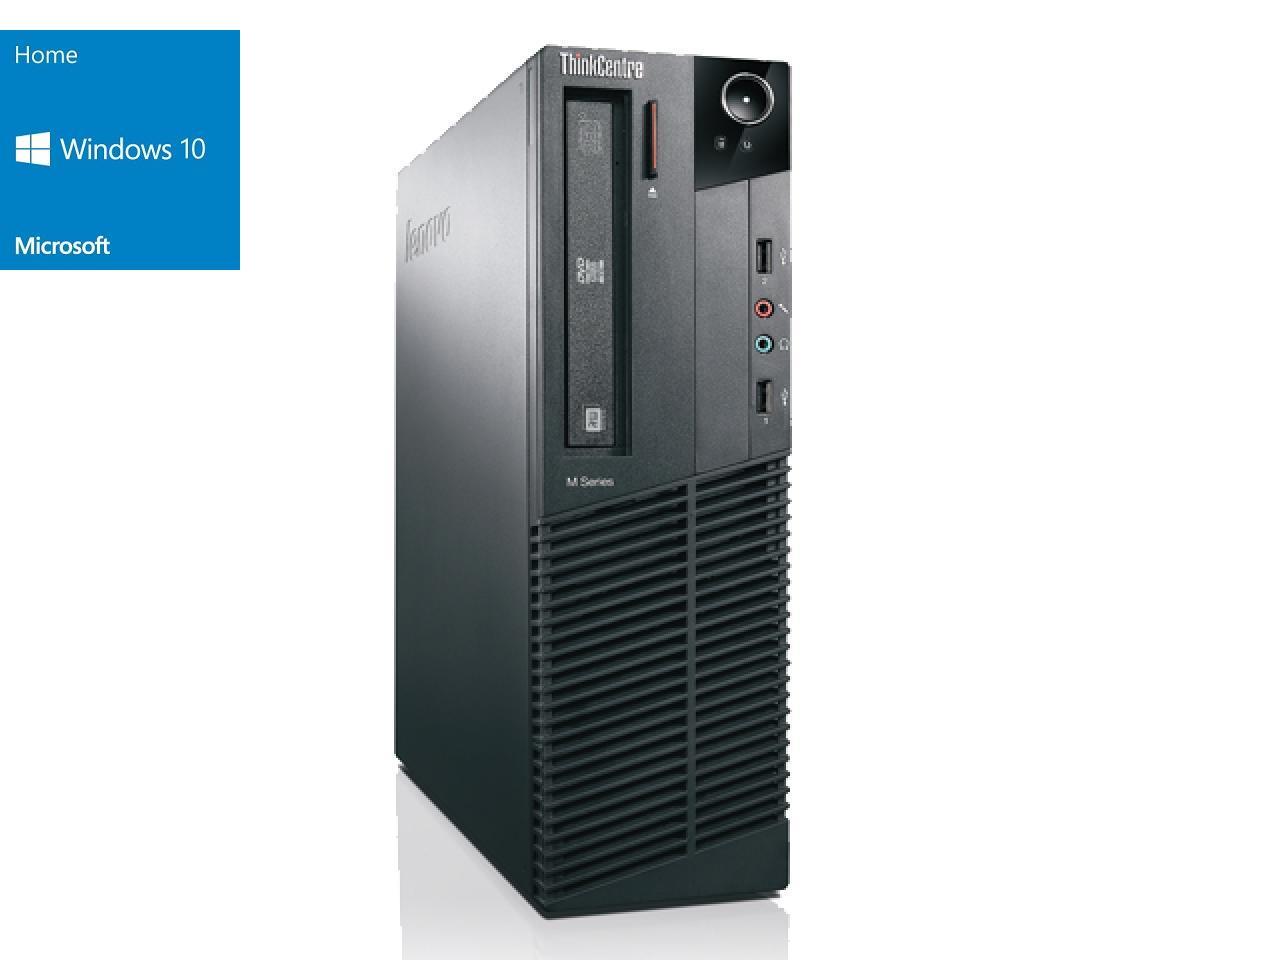 Lenovo ThinkCentre M90p SFF  - shop.bb-net.de